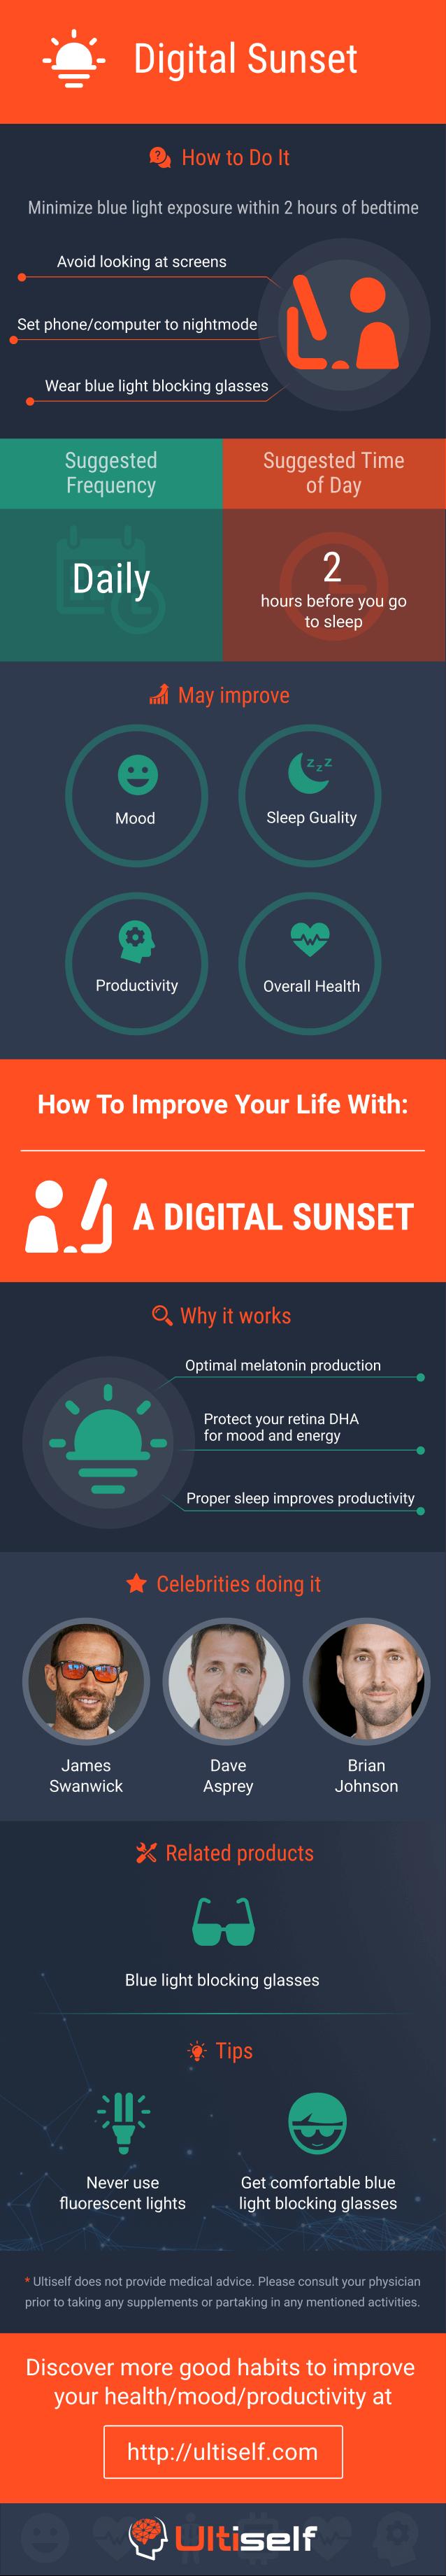 Digital sunset infographic